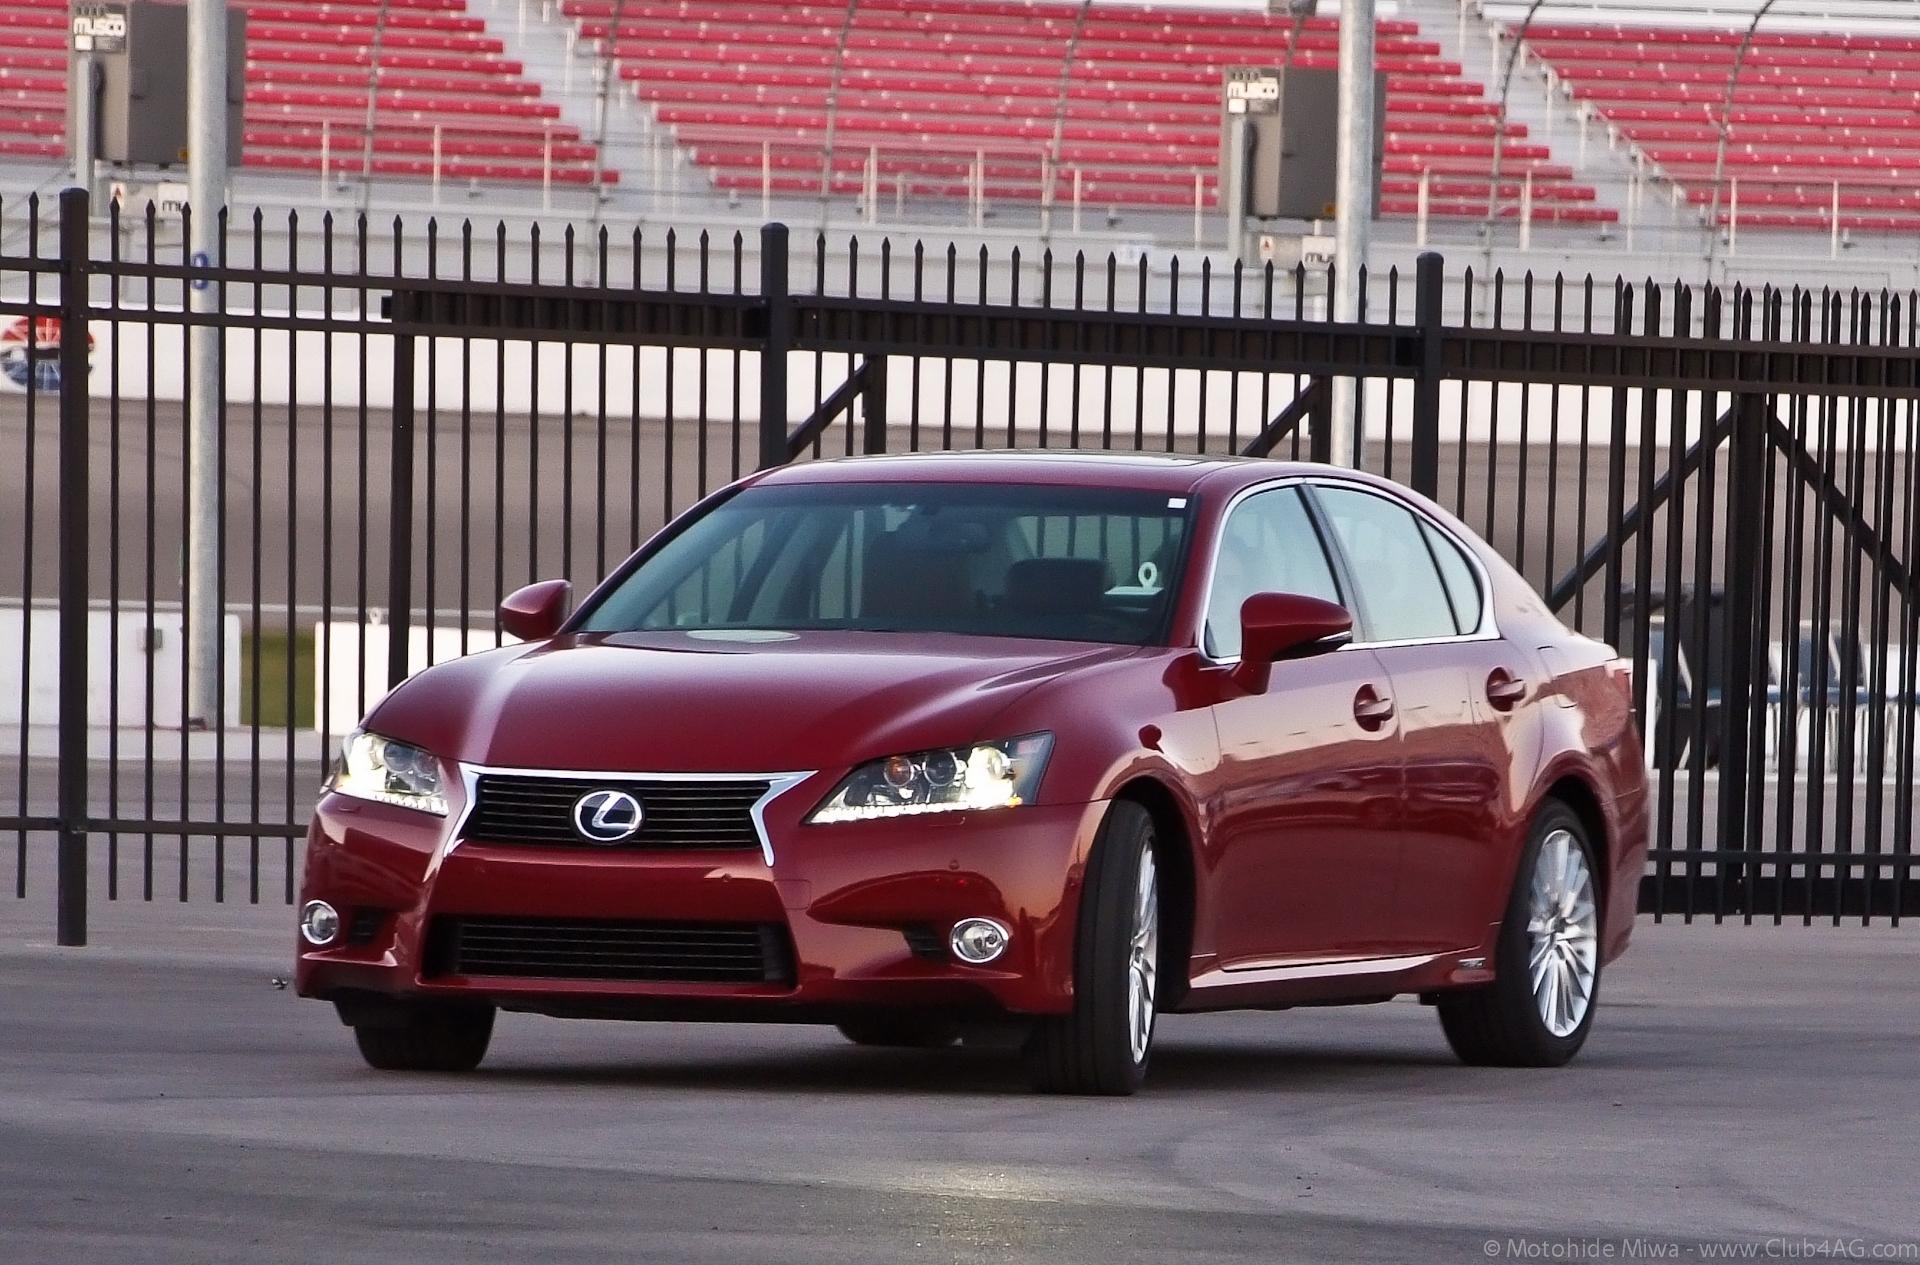 https://upload.wikimedia.org/wikipedia/commons/1/1b/2013_Lexus_GS_450h_Las_Vegas.jpg